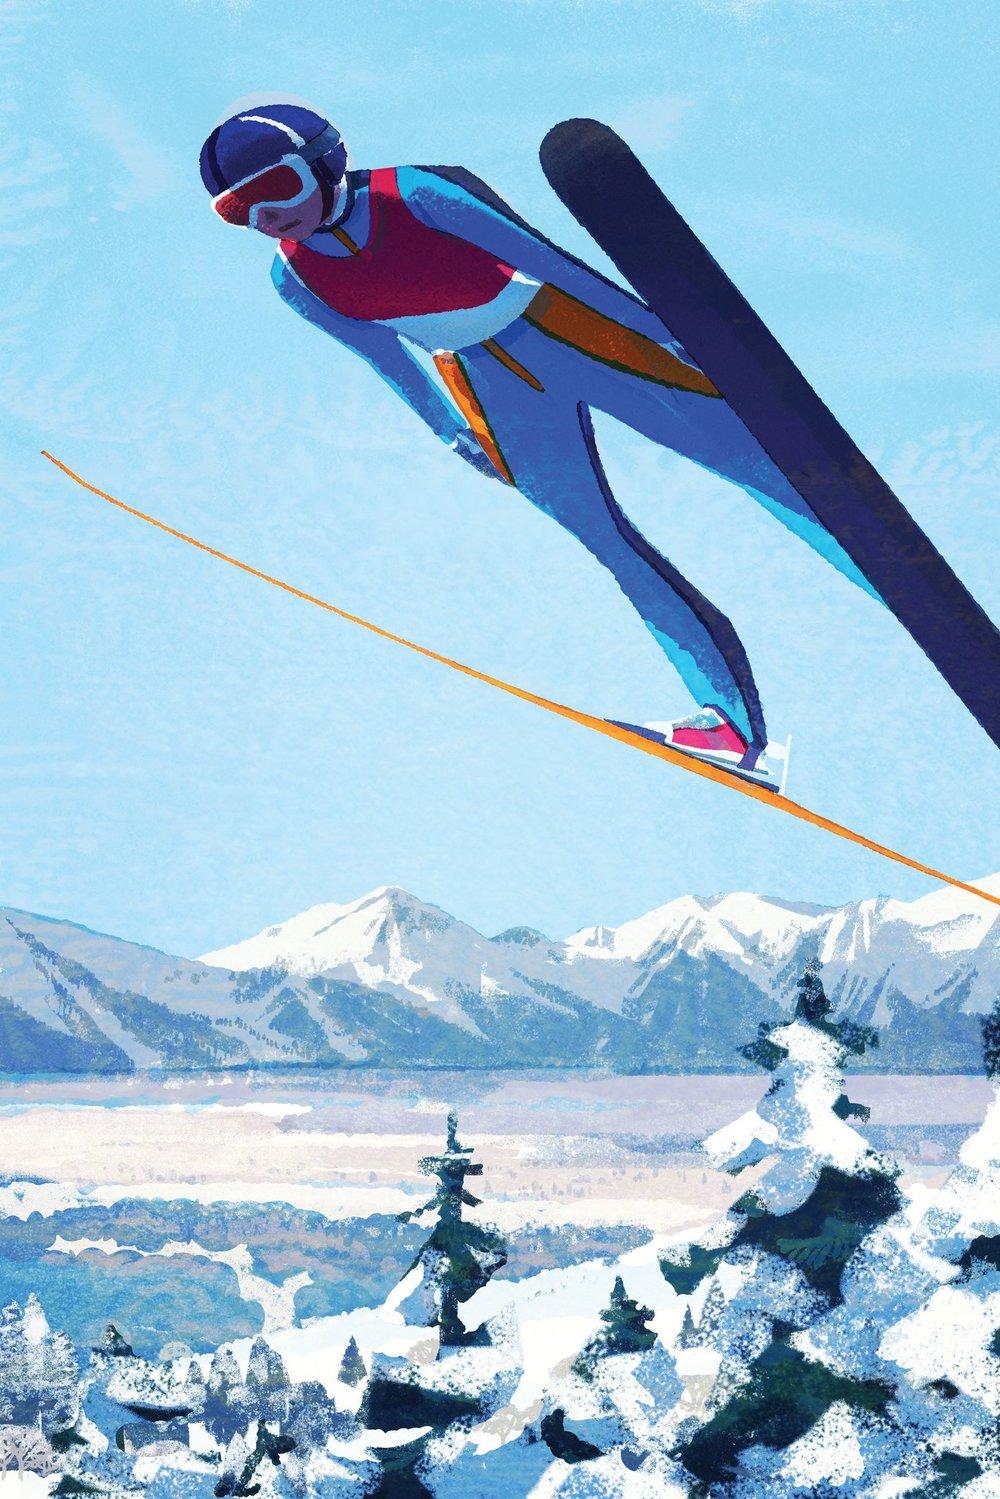 04mag-olympics-ski-jumping-image1-superJumbo-v2.jpg